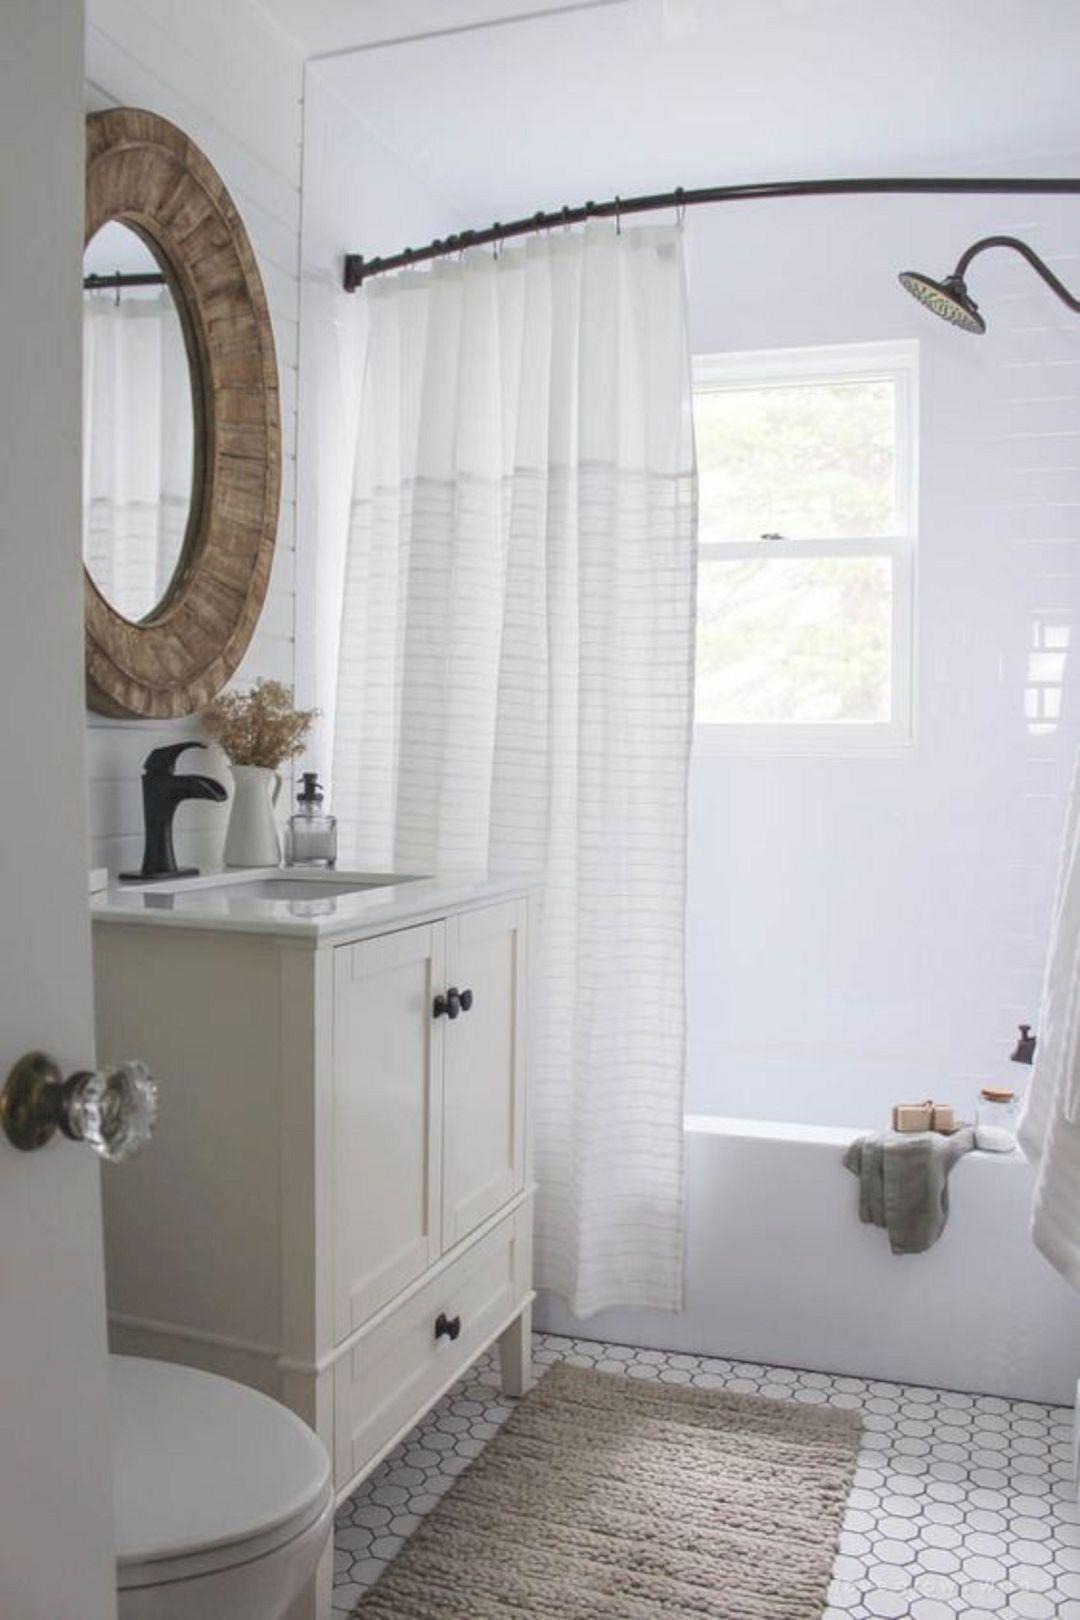 Small Bathroom Renovation Ideas 5 | Bathroom Updating | Pinterest ...